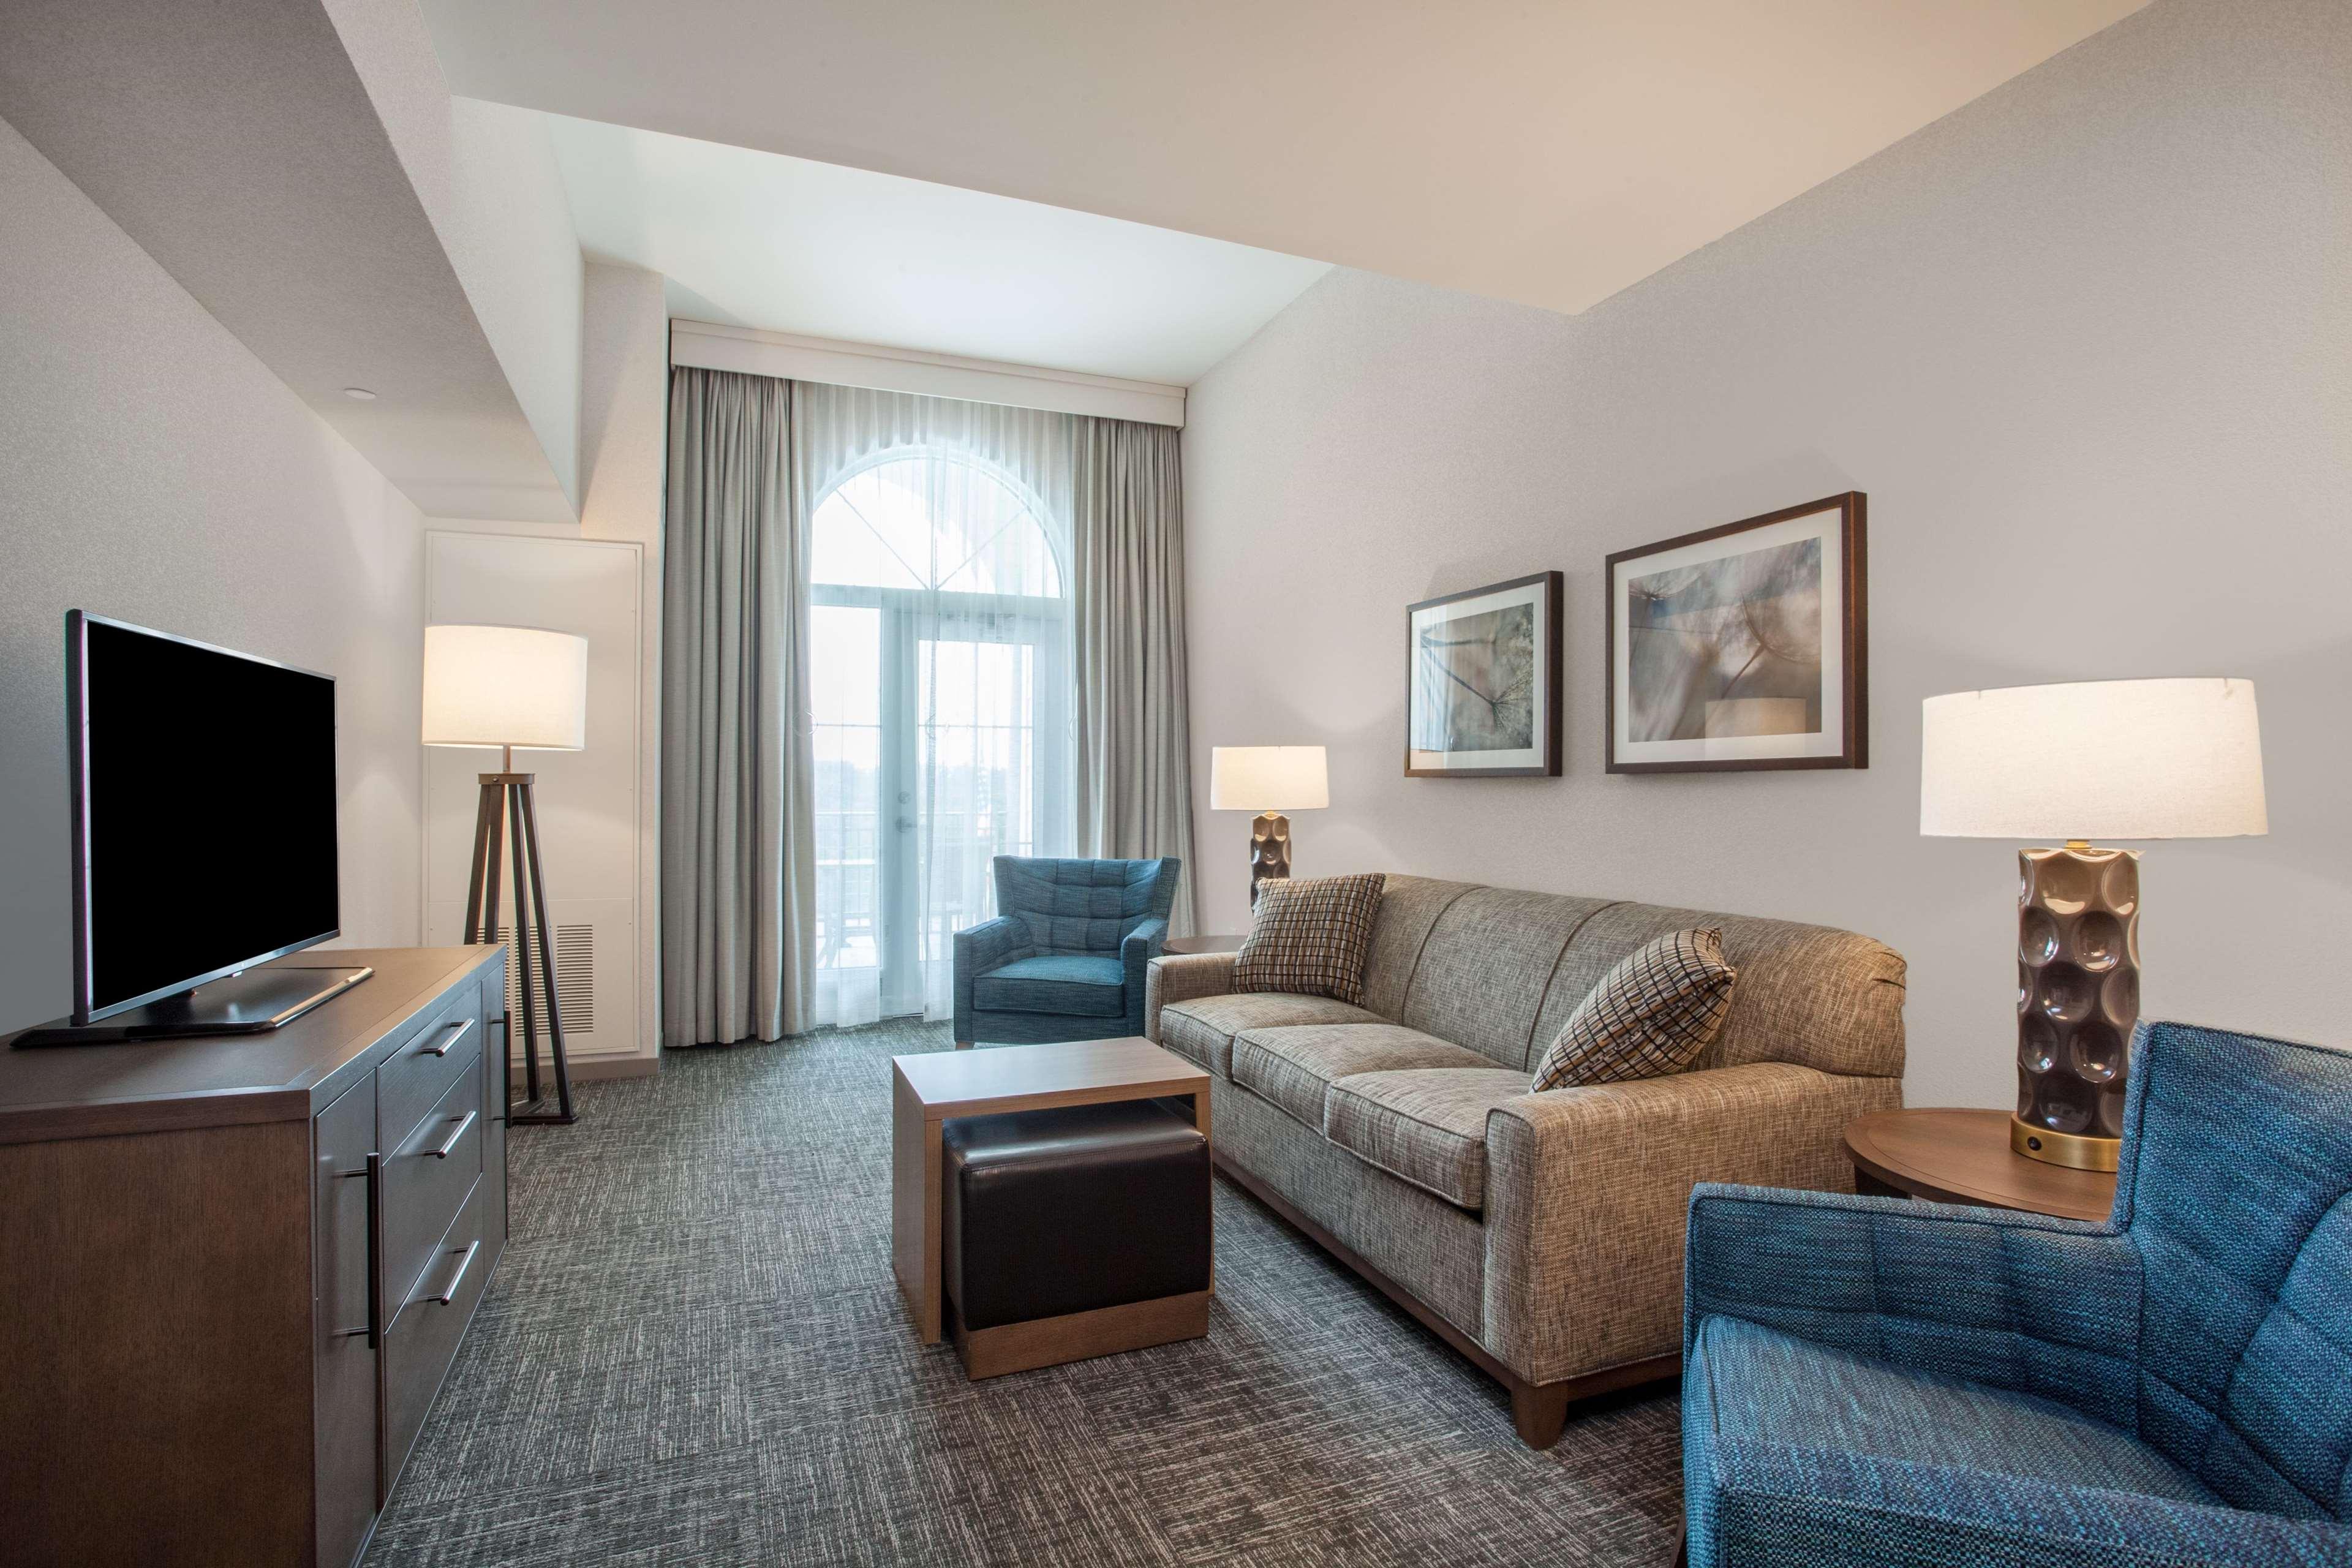 Homewood Suites by Hilton Saratoga Springs image 24